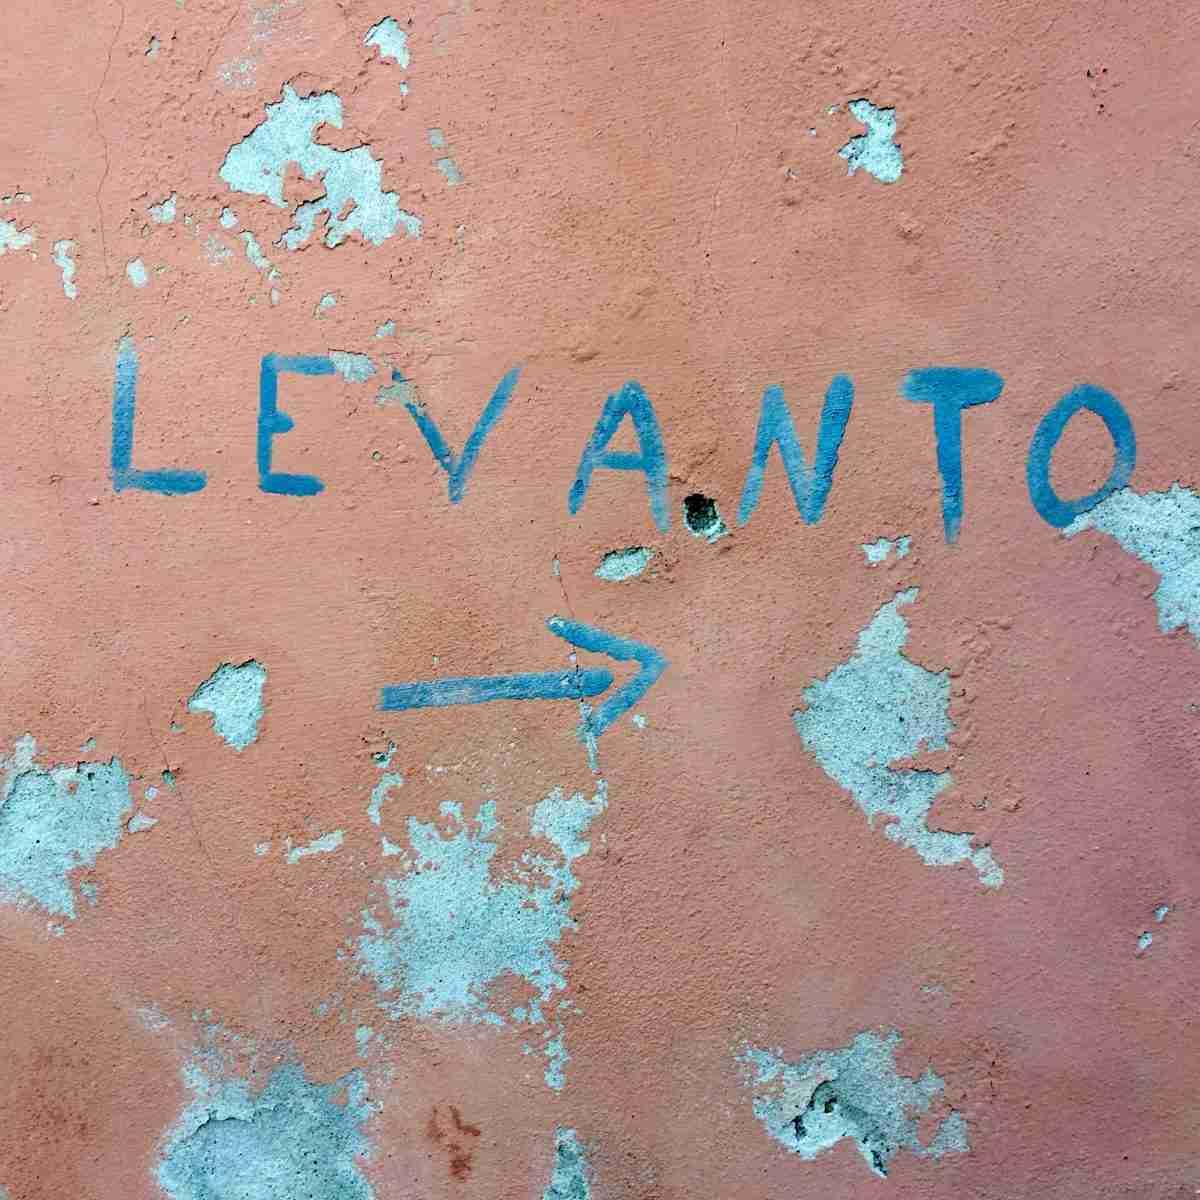 Wegweiser nach Levanto